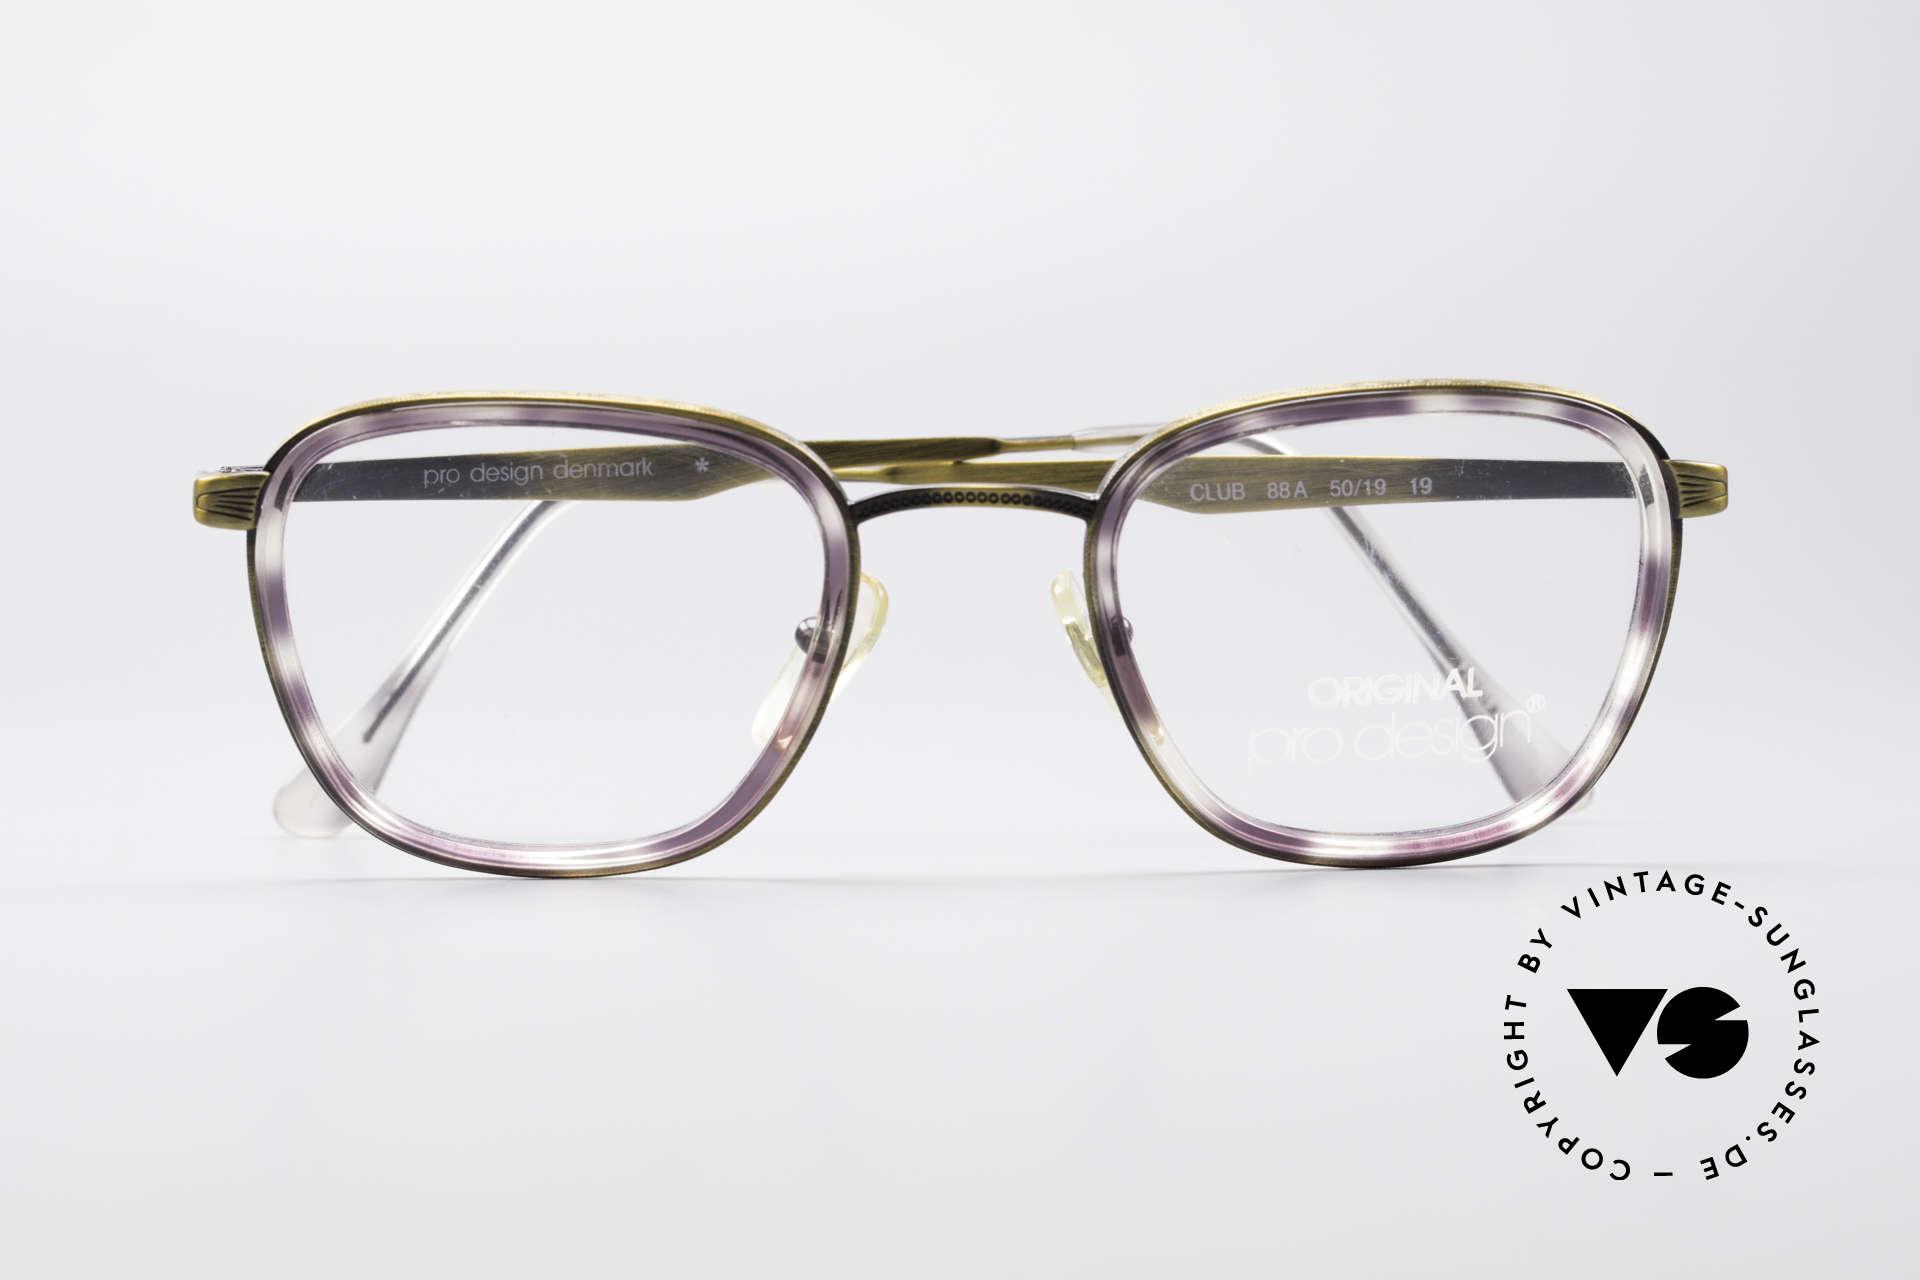 9db02f45b4 Glasses ProDesign Denmark Club 88A Vintage Glasses | Vintage Sunglasses